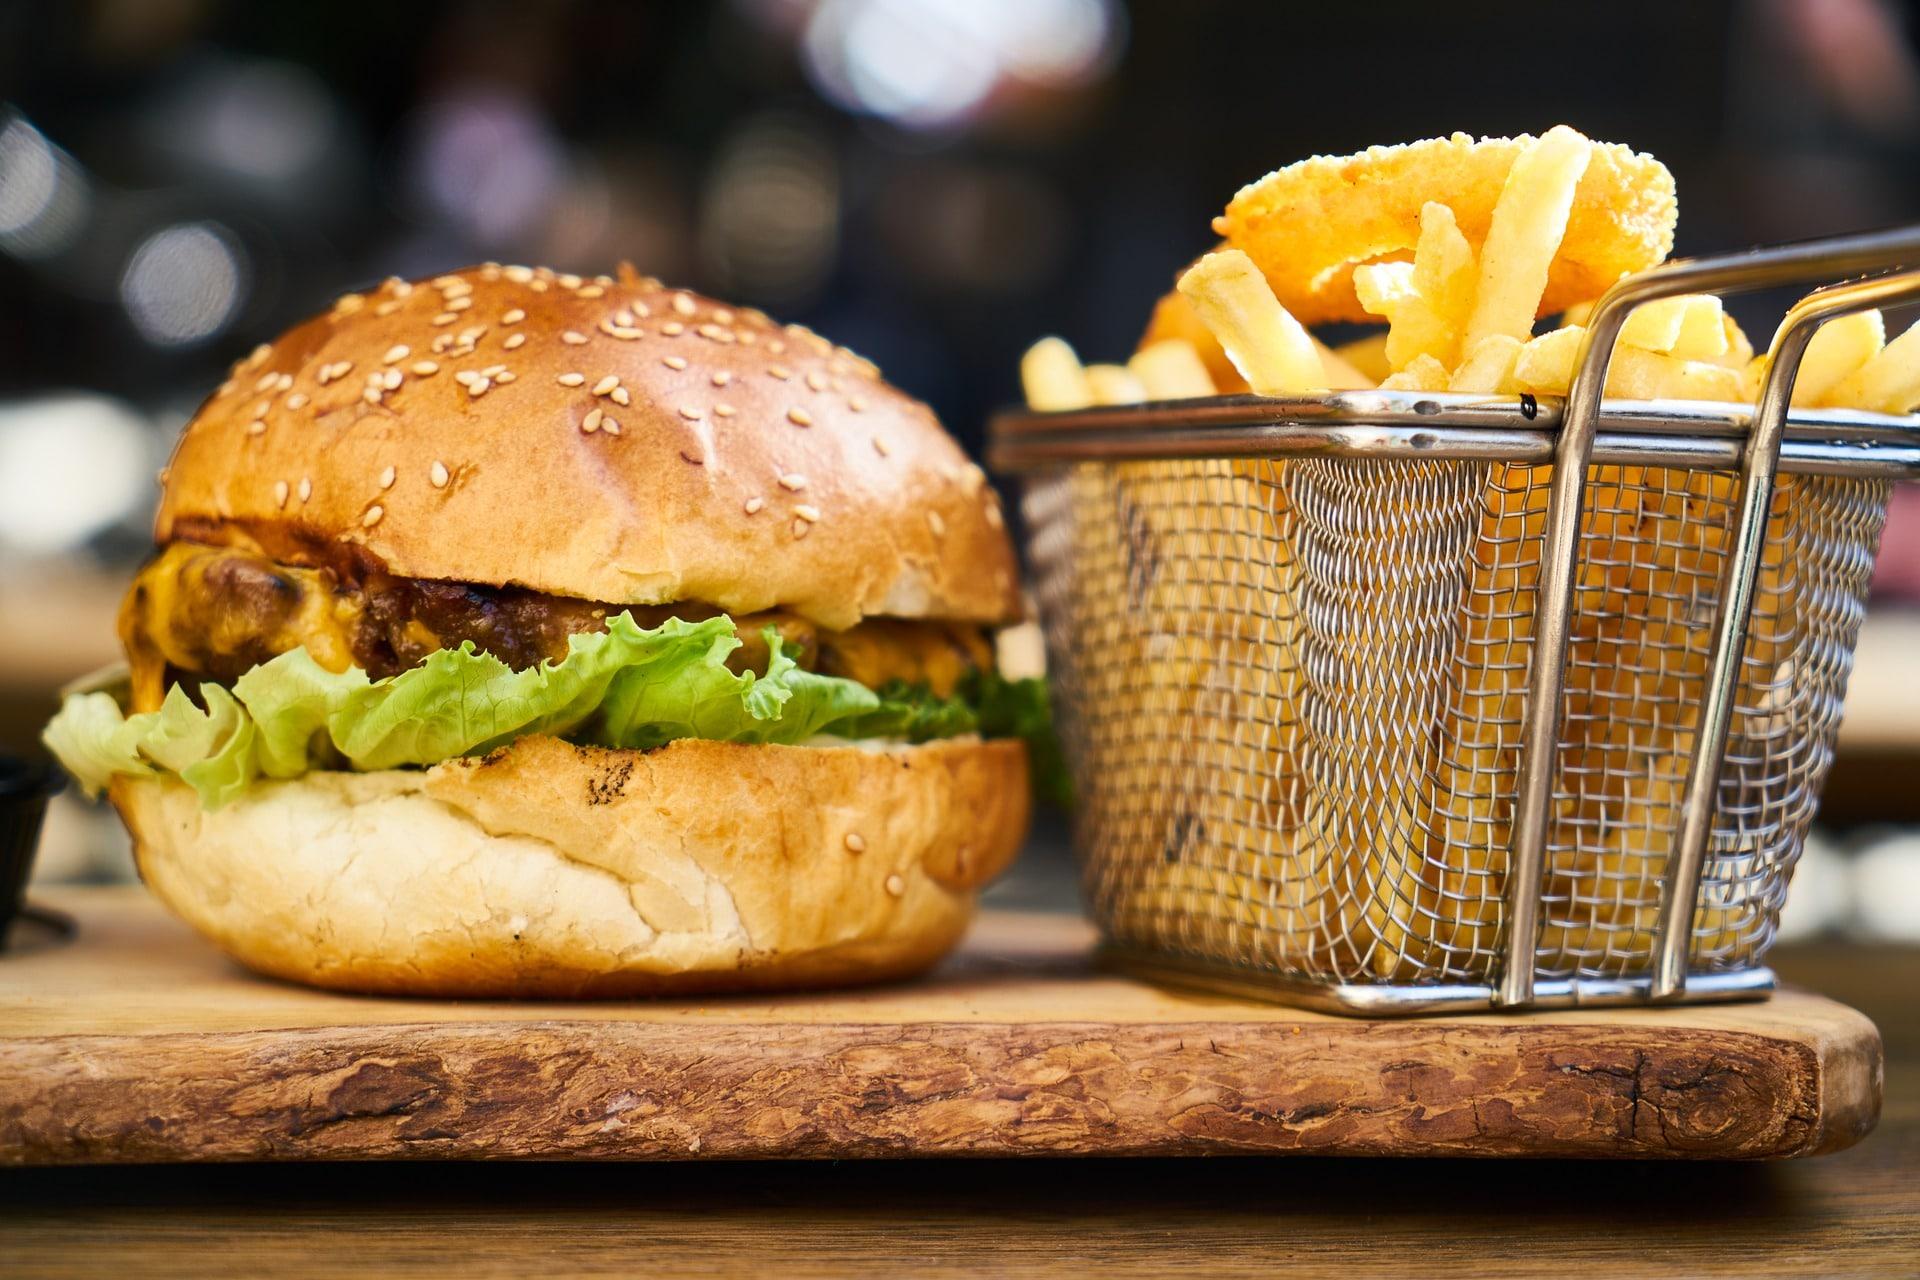 creatinine level. burger. processed food. high sodium food. fried. deep fried. www.blisslife.in